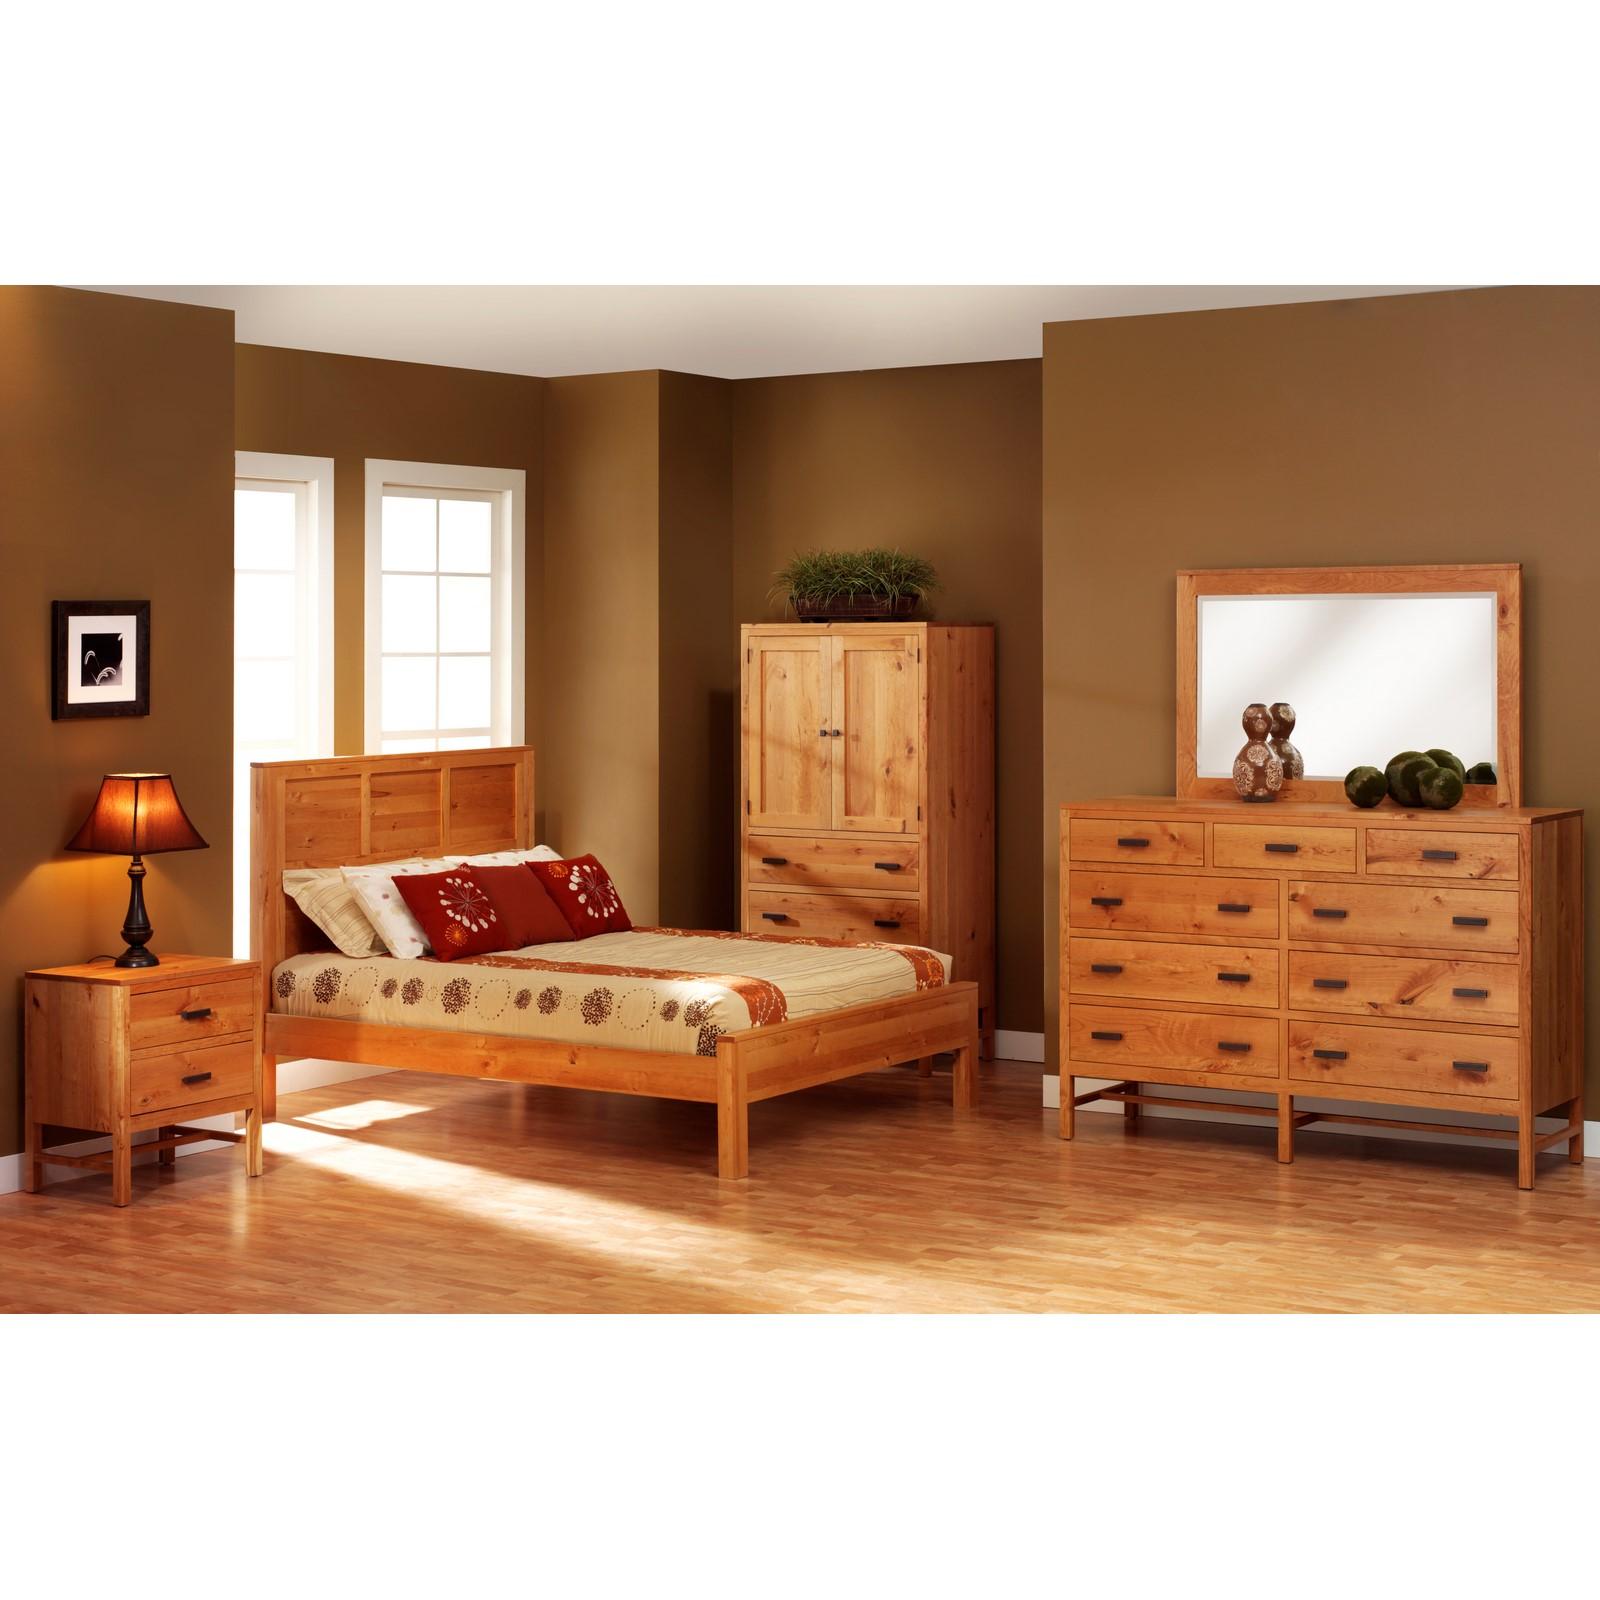 Millcraft Lynnwood Panel Bedroom Set - Stewart Roth Furniture